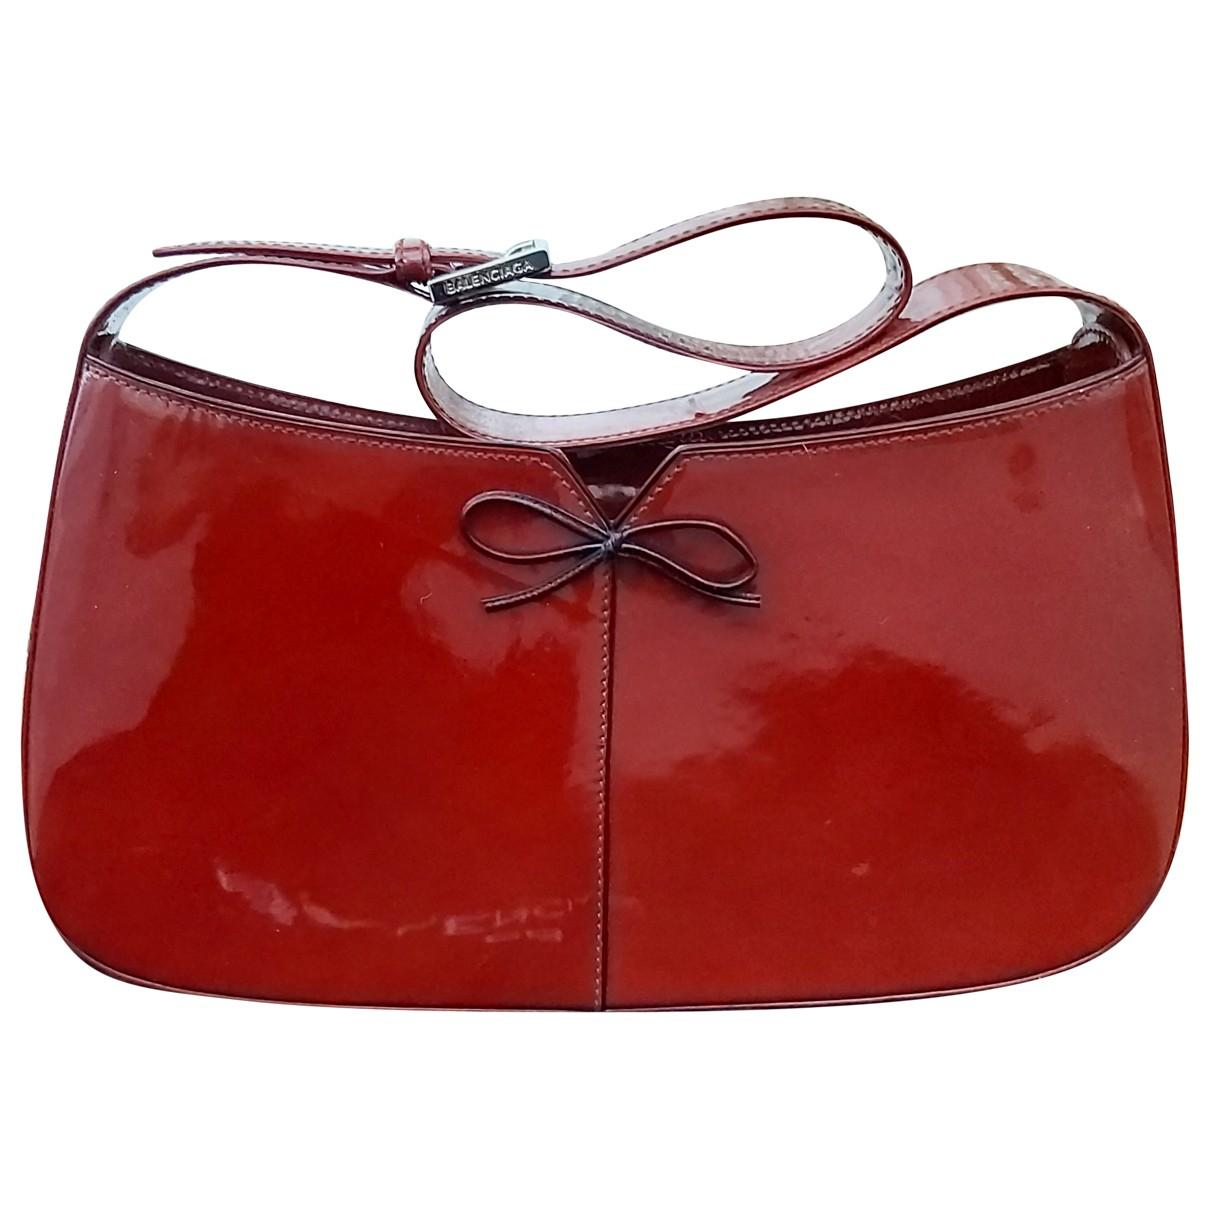 Balenciaga \N Burgundy Patent leather handbag for Women \N